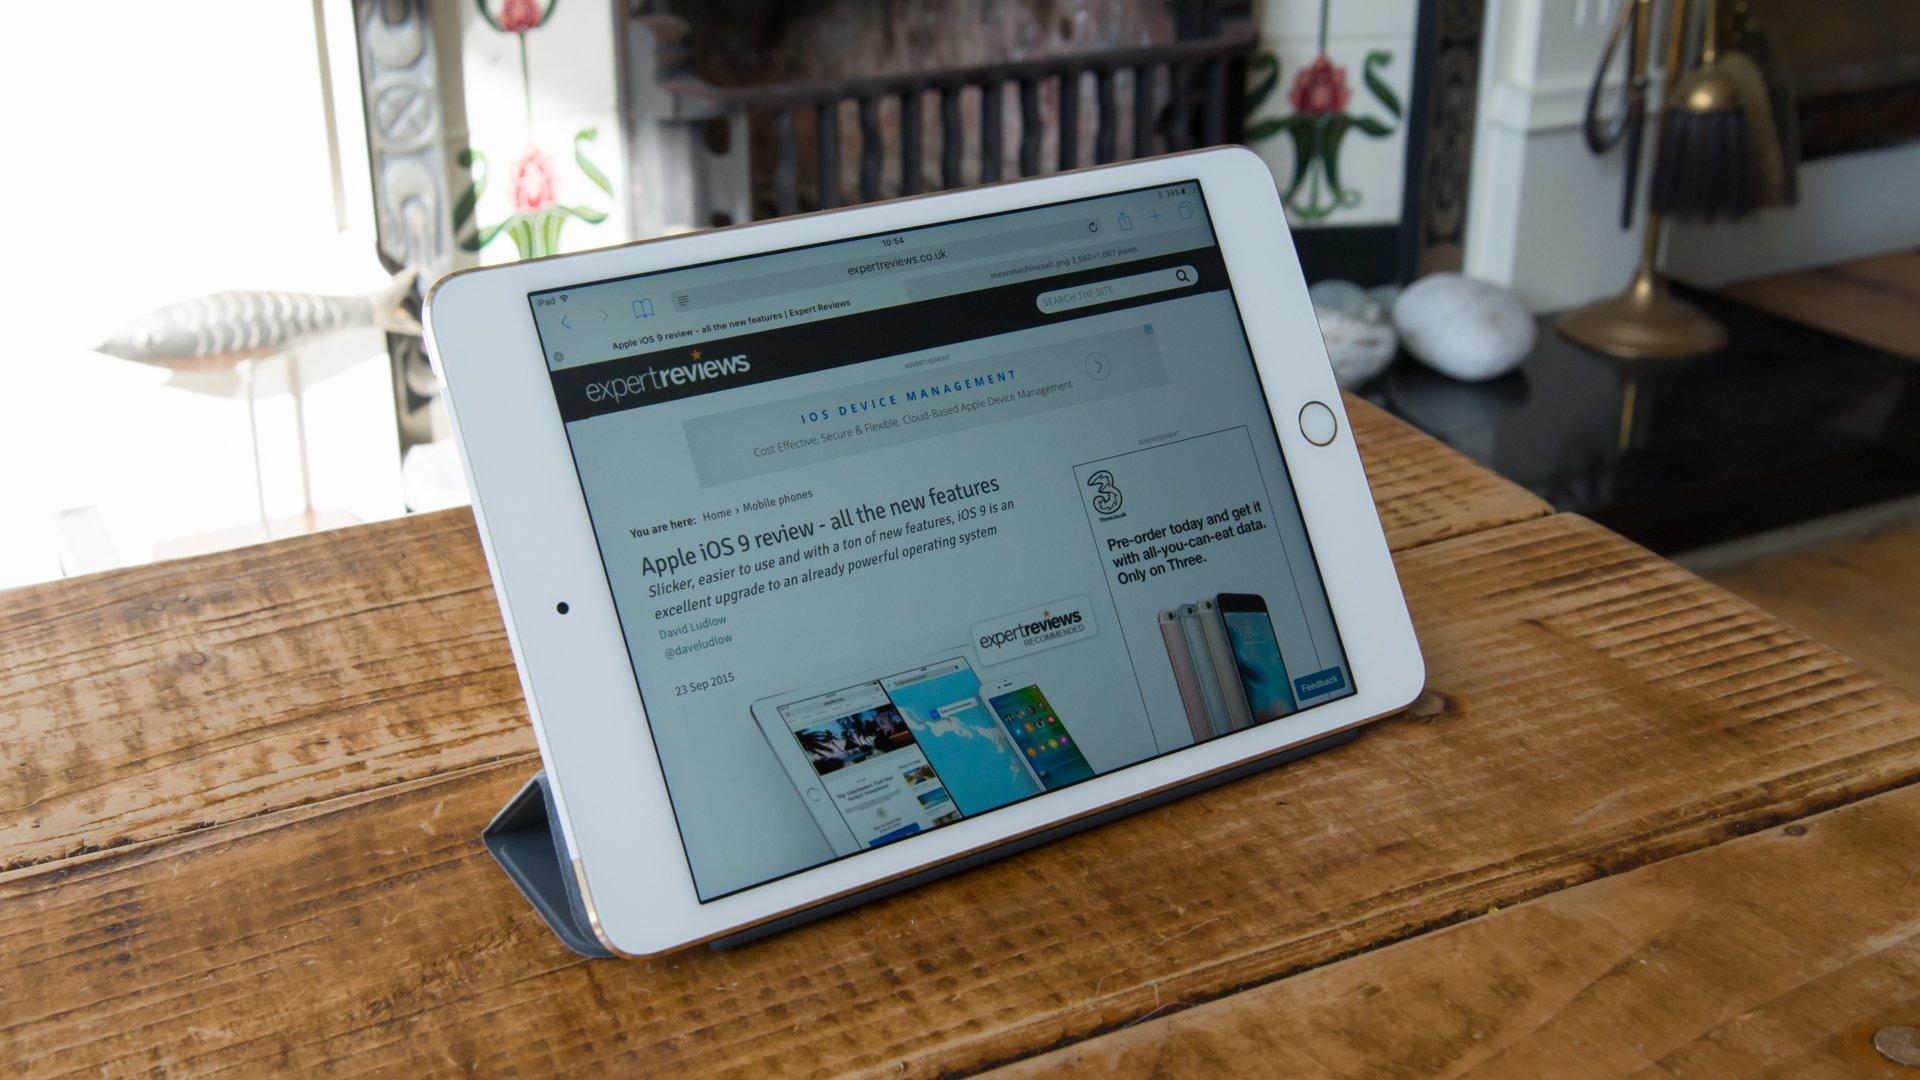 Apple will not merge Mac and iPad